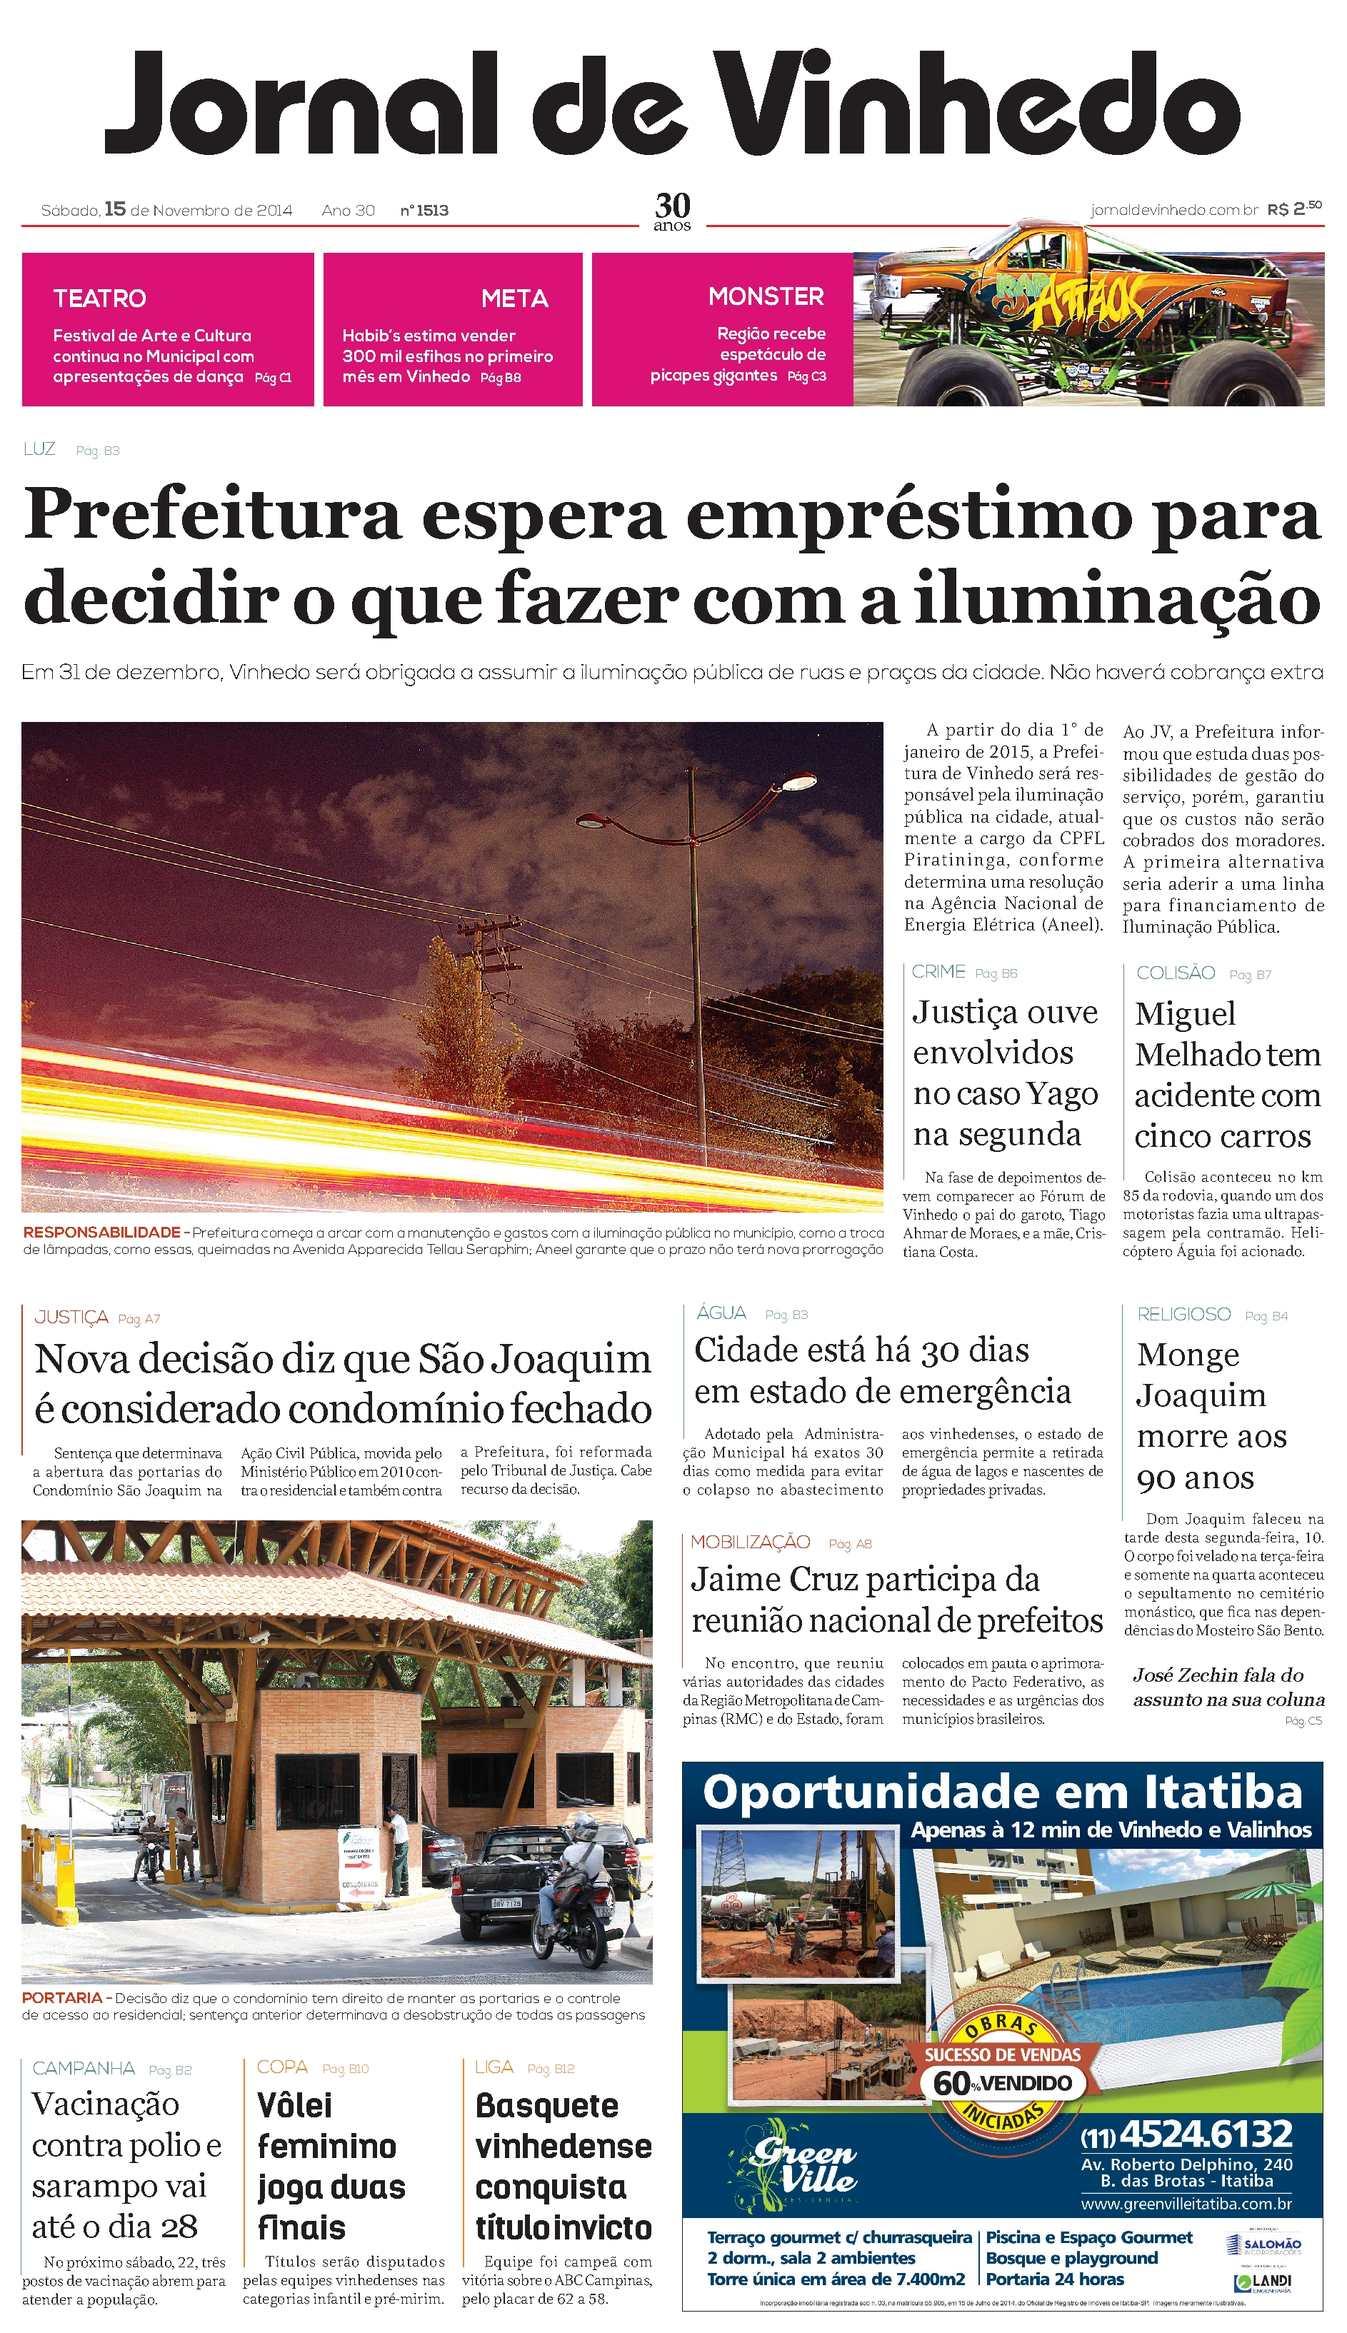 f3a5e54629e1d Calaméo - Jornal De Vinhedo Sábado, 15 De Novembro De 2014 Edic 1513 Ok